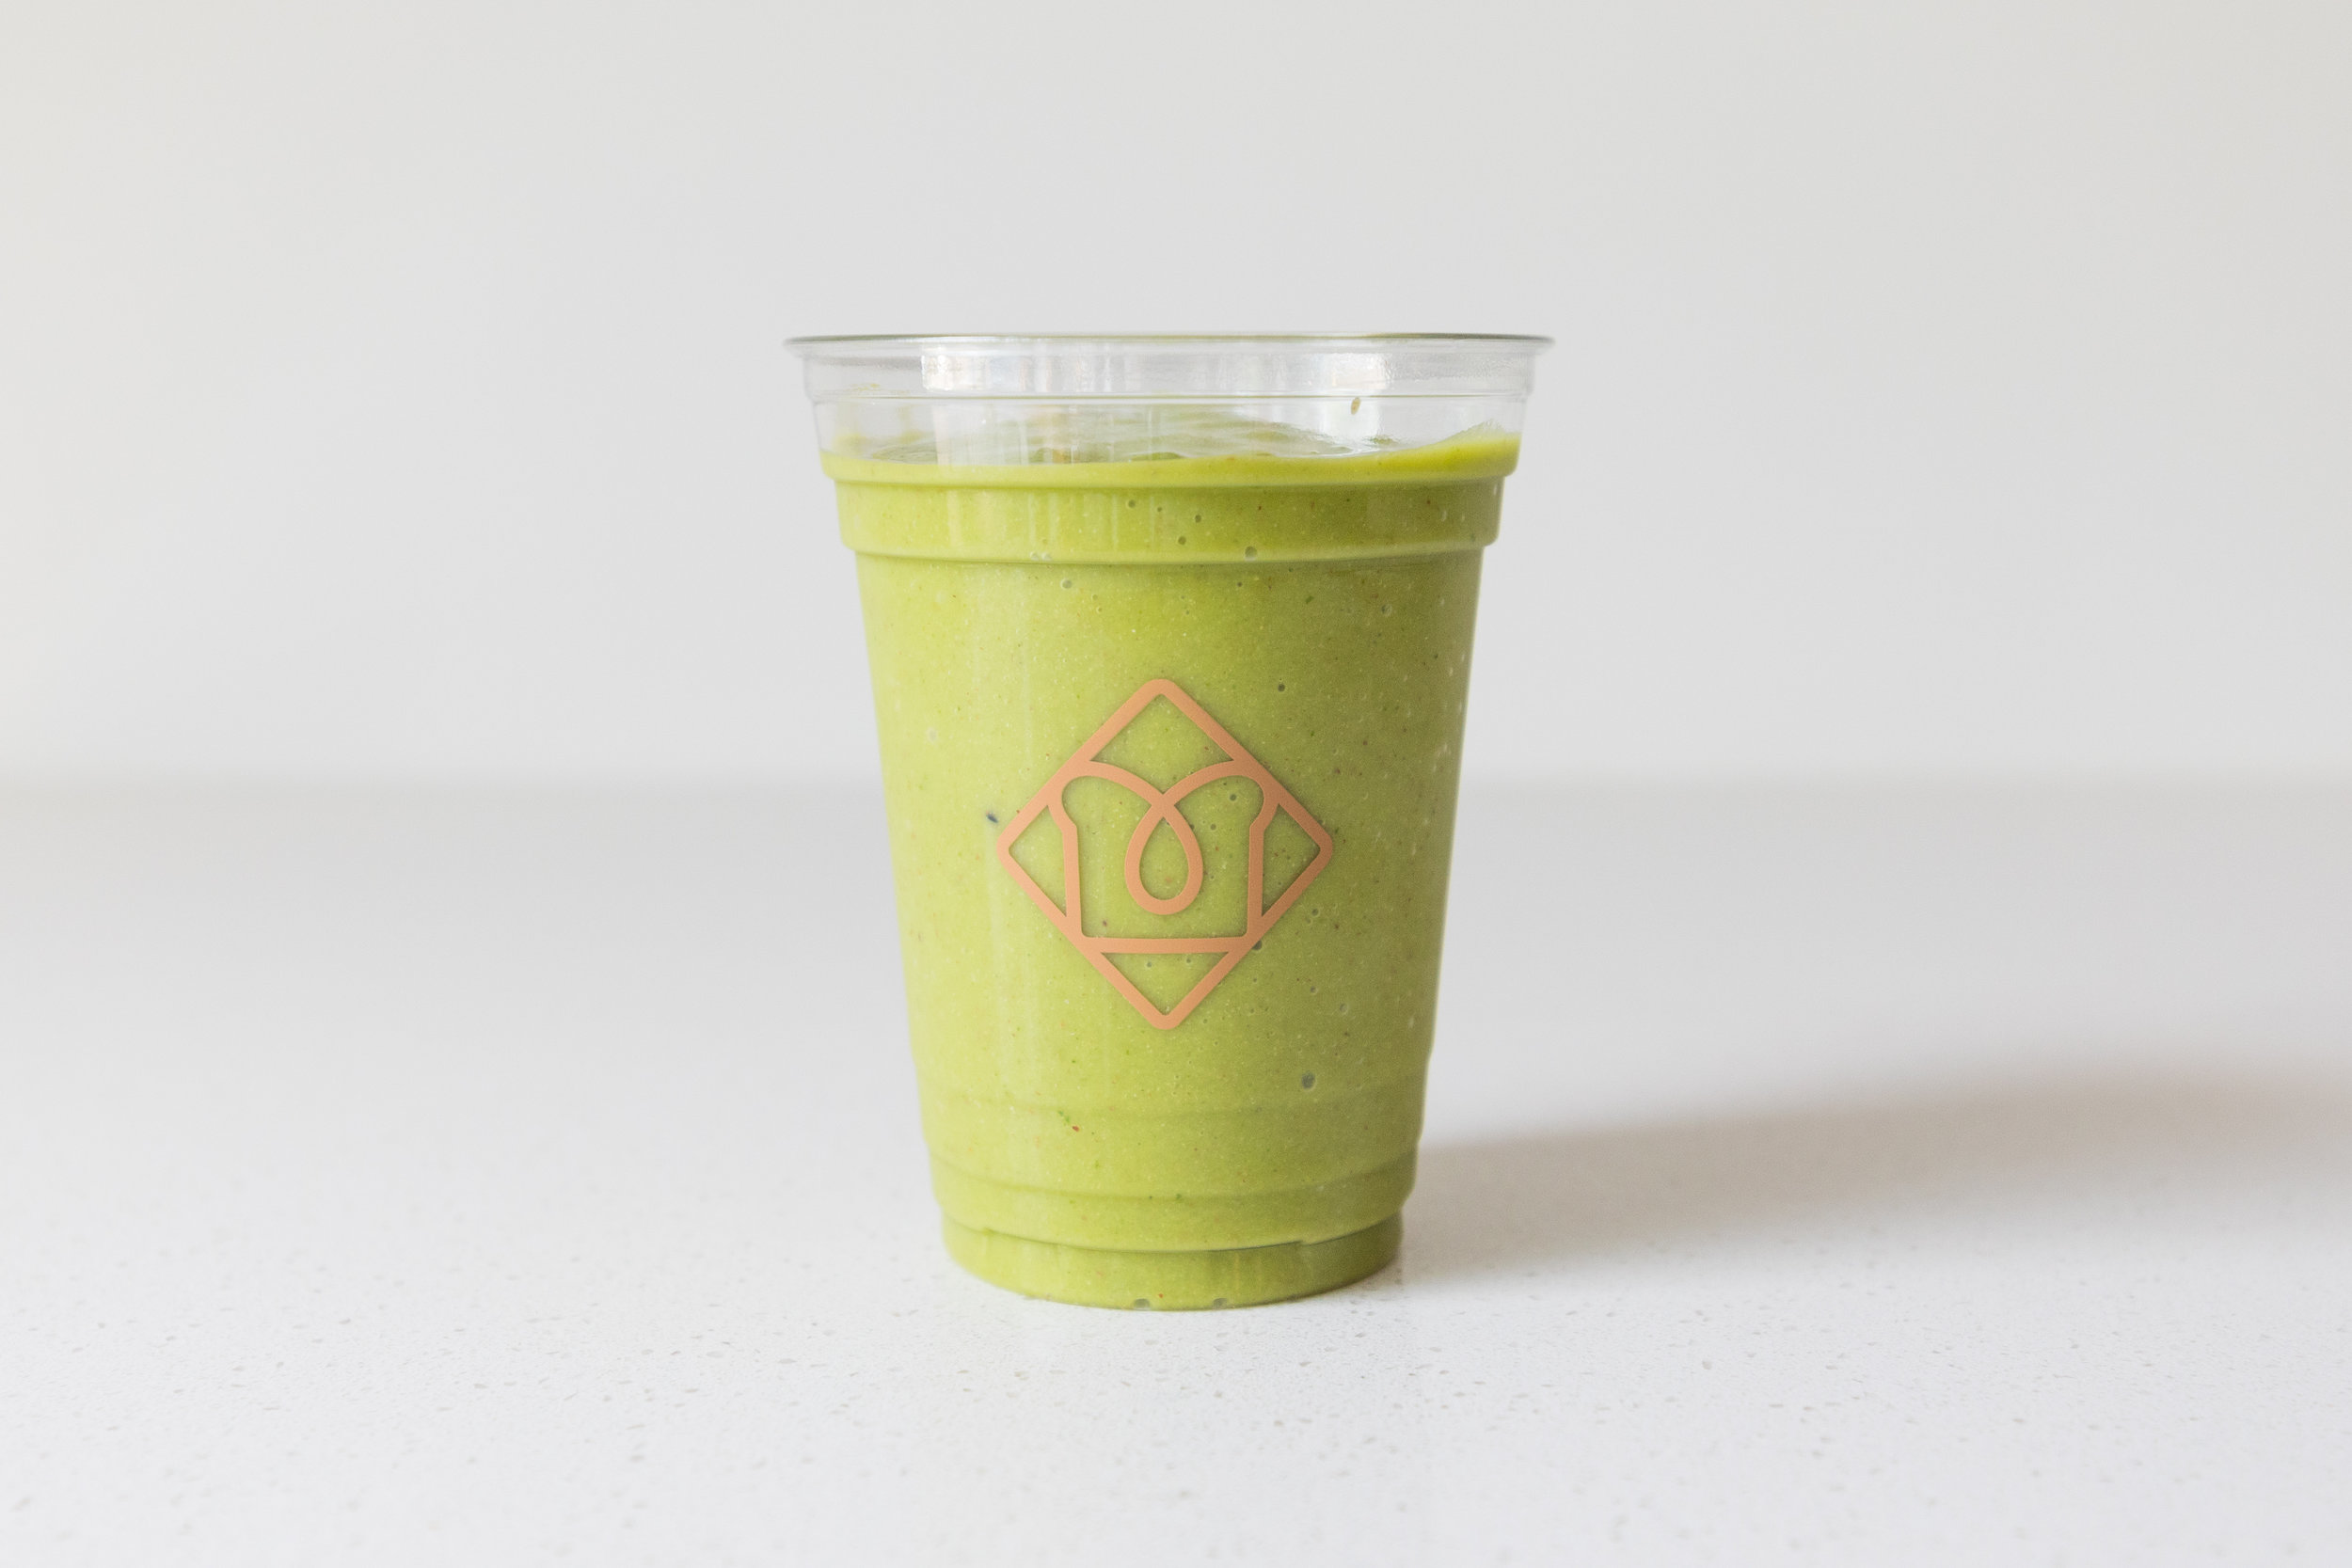 Green Machine:  Banana / Pineapple / Mango / Spinach / Kale / Hemp Seeds / Flax Seeds / Coconut Water